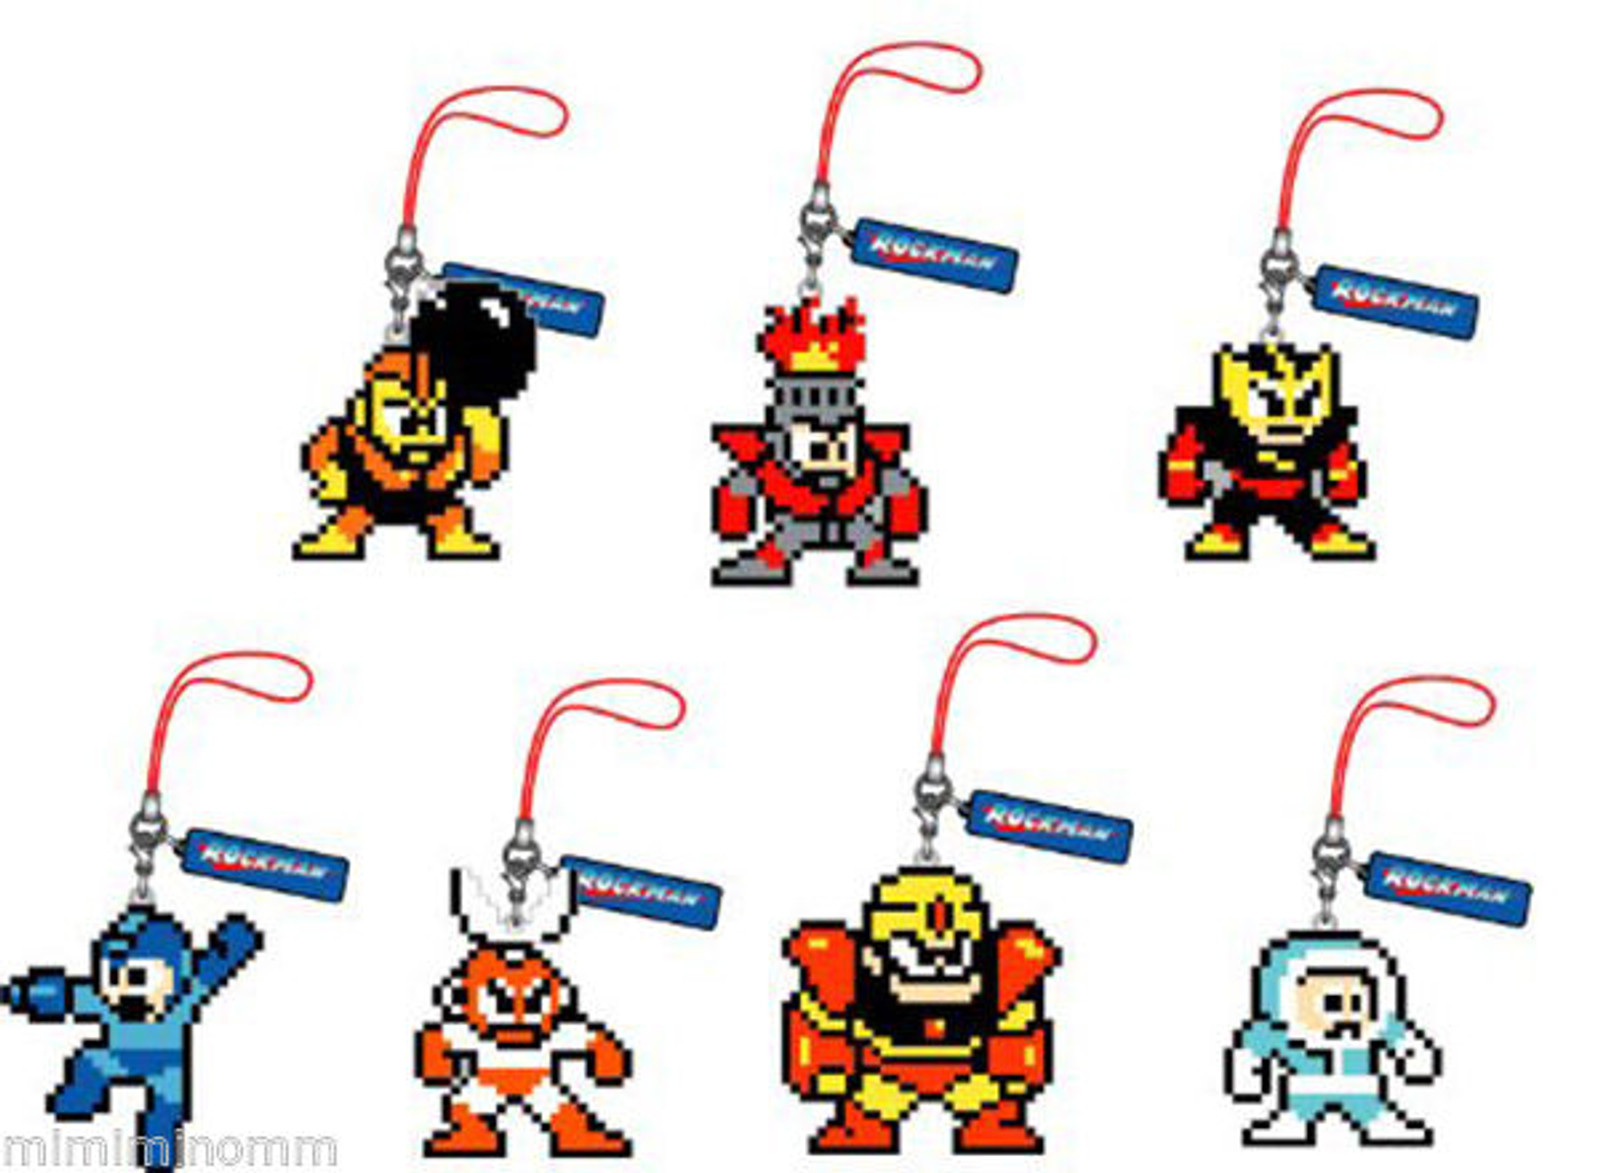 Set of 7 Rockman Mega man Dot Rubber Mobile Strap Collection Vol.2 JAPAN GAME NES